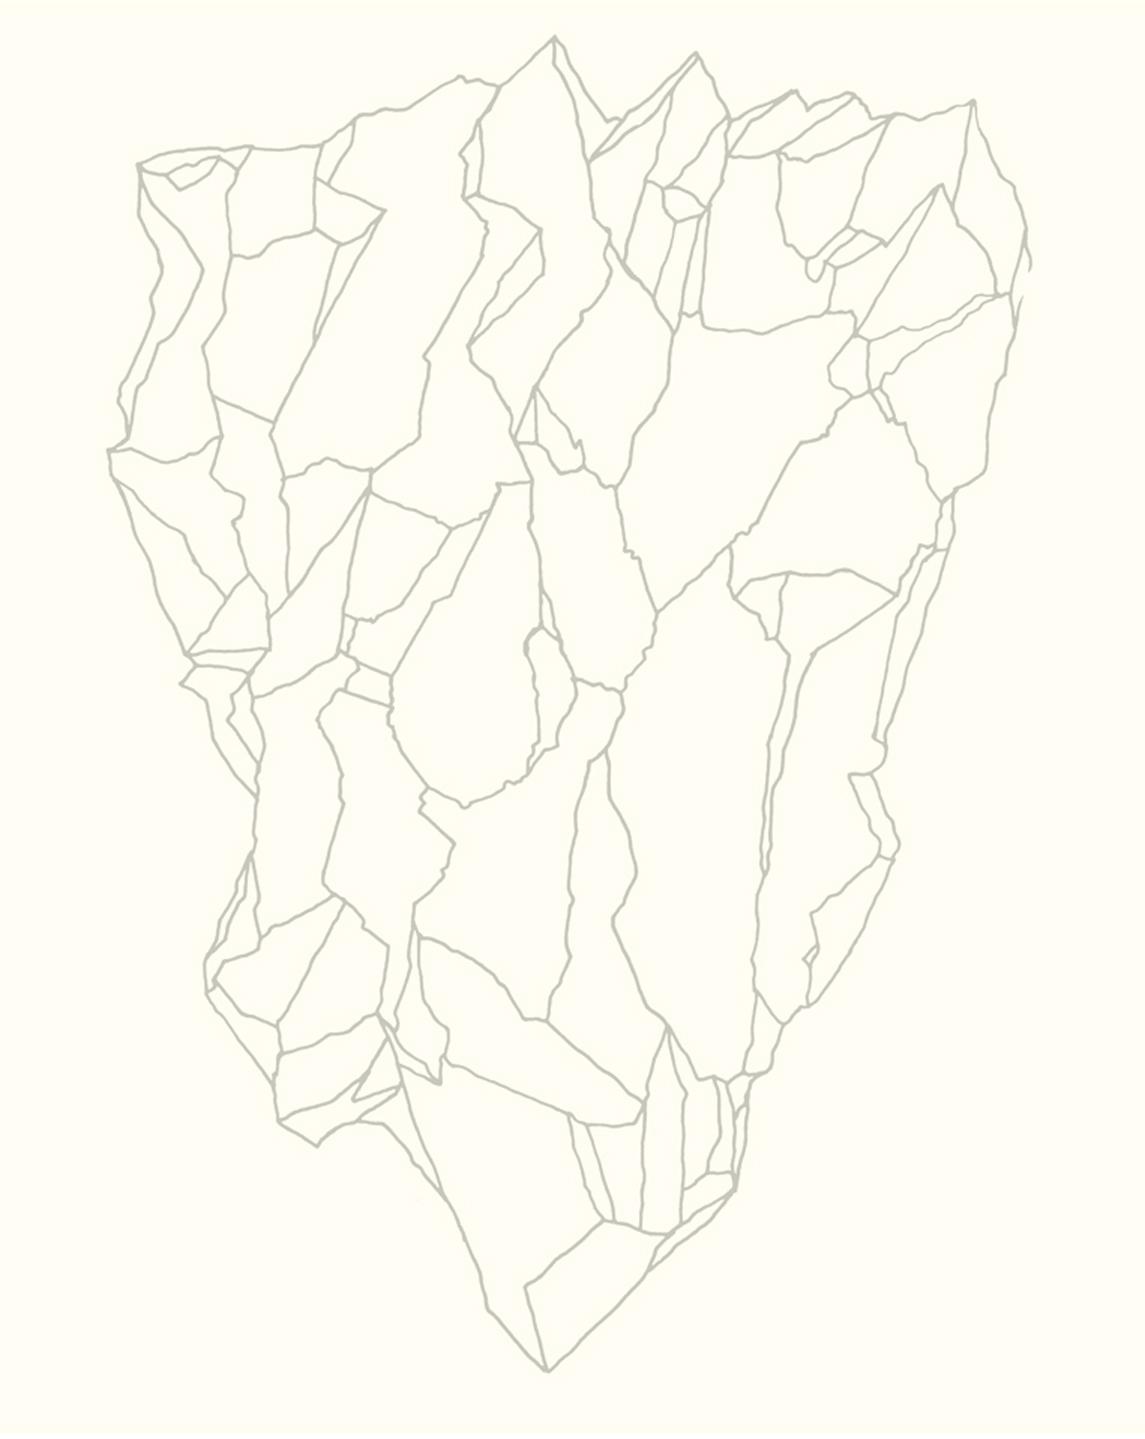 Untitled_Geneva_WhiteWhite_Edition of 4_48x60cm_lg.jpg